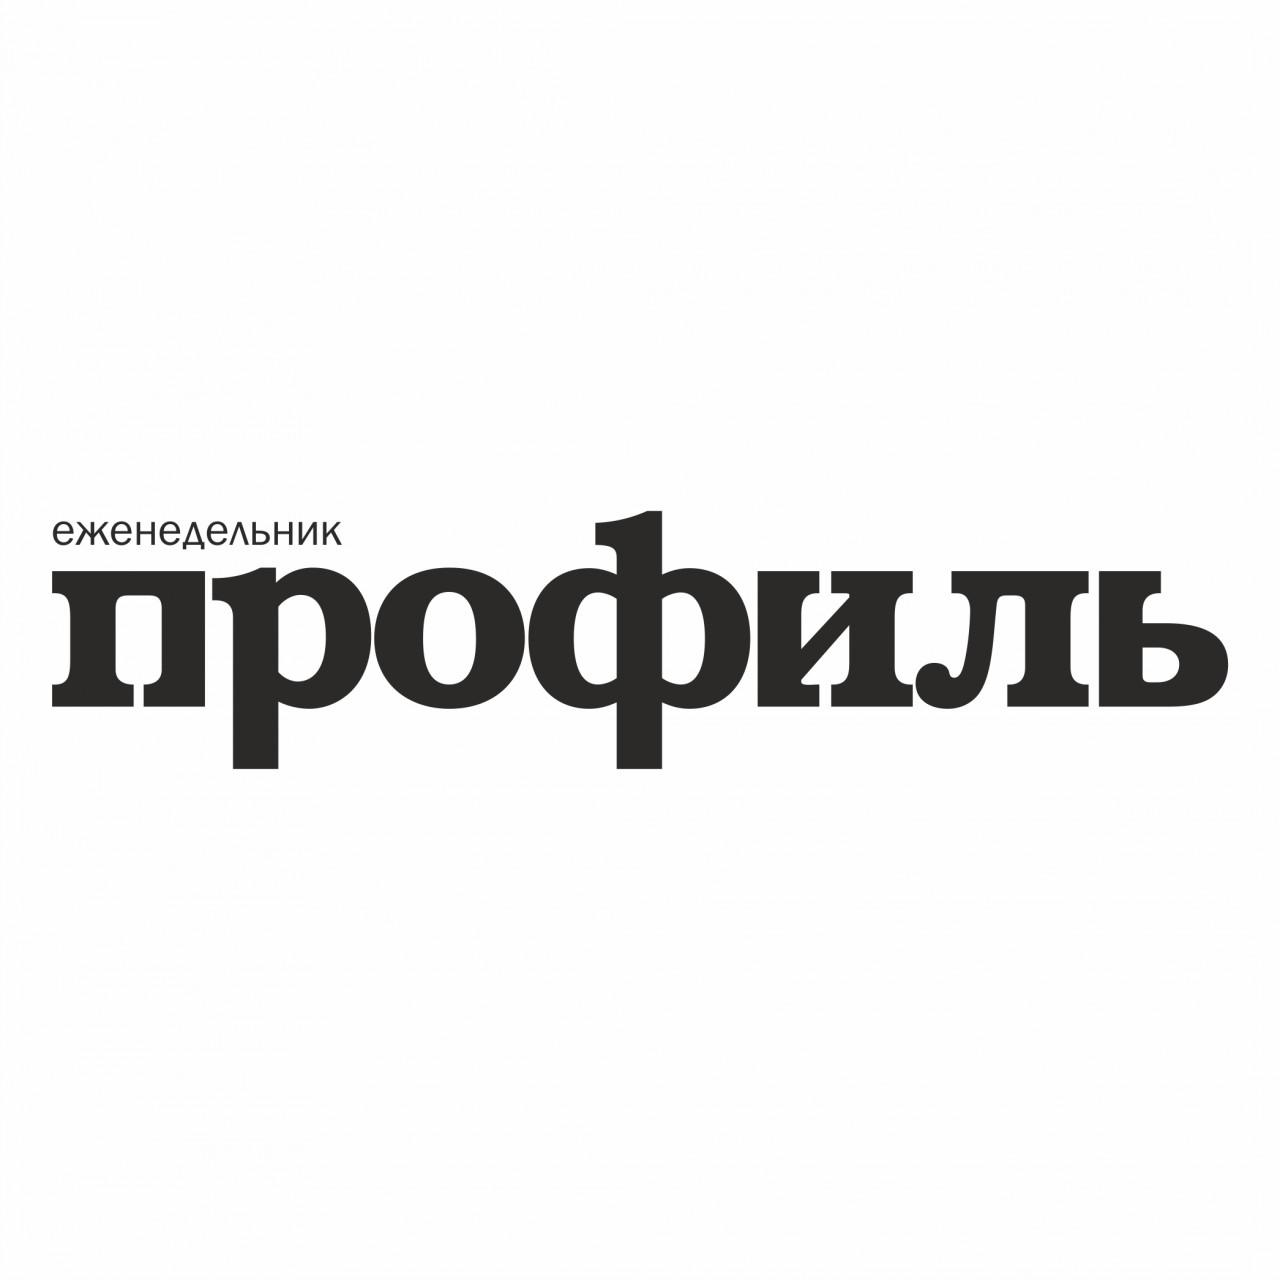 В Кремле назвали спекуляциями слухи об уходе Лаврова с поста министра